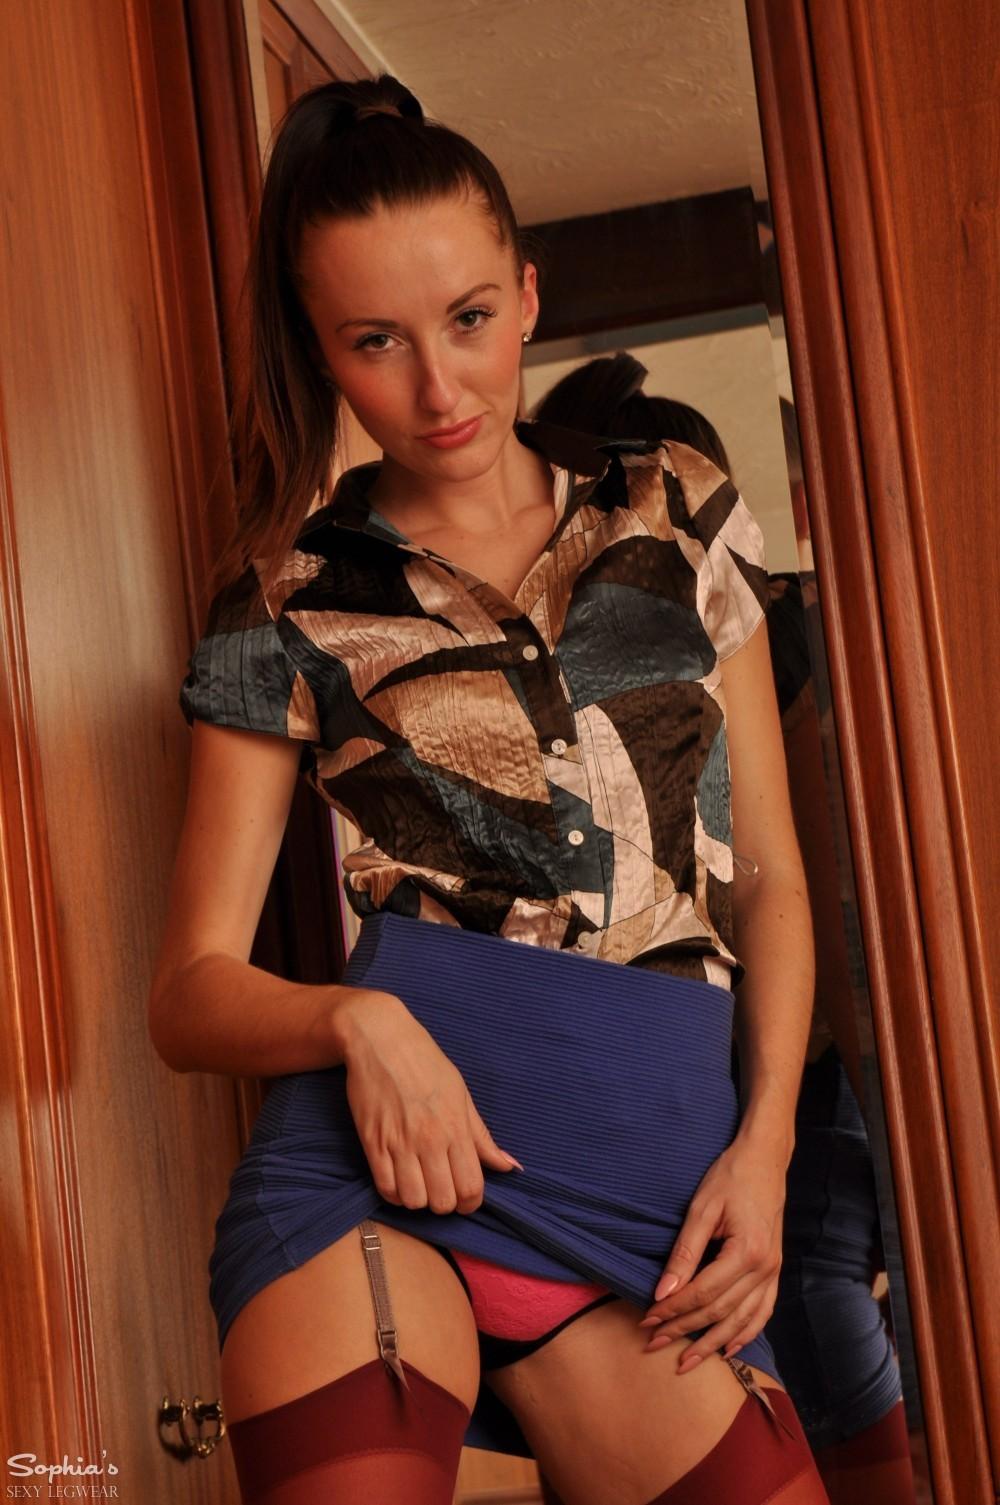 Sophia Smith - Нижнее белье - Галерея № 3548746